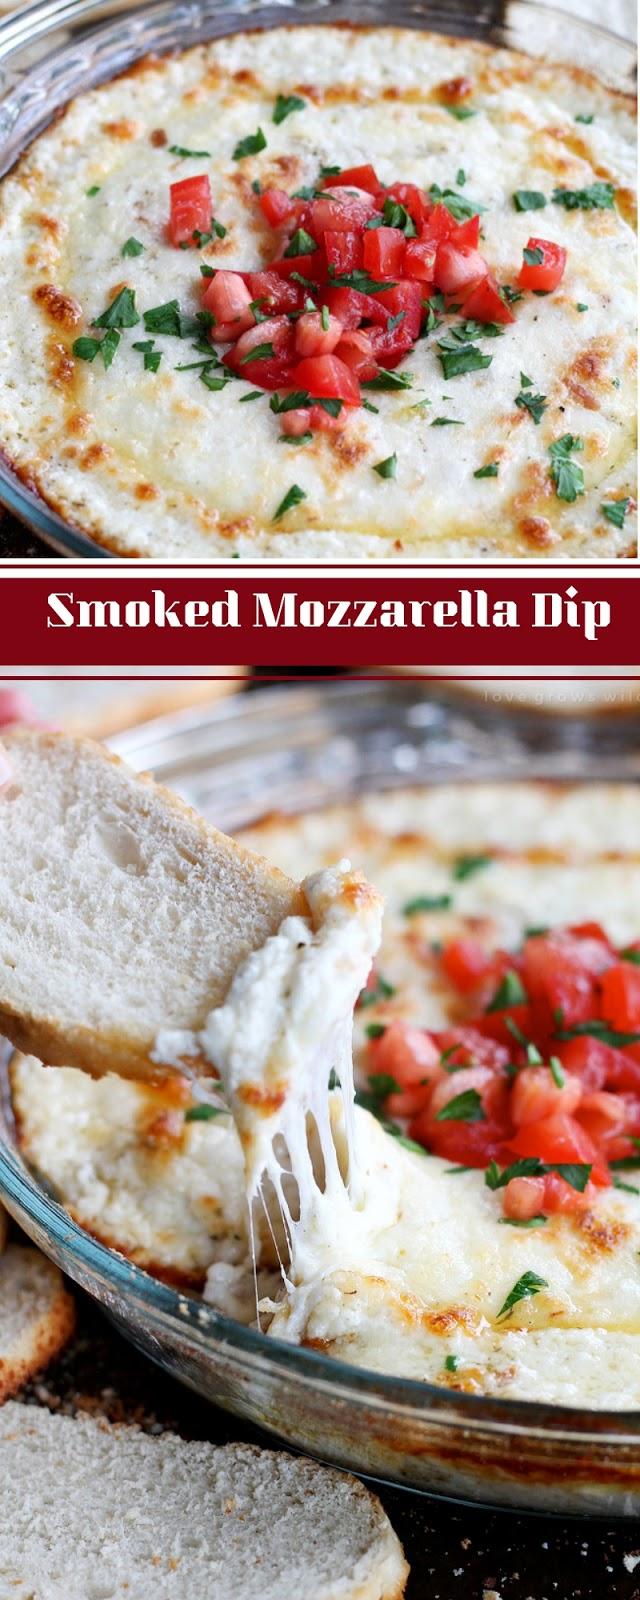 Smoked Mozzarella Dip